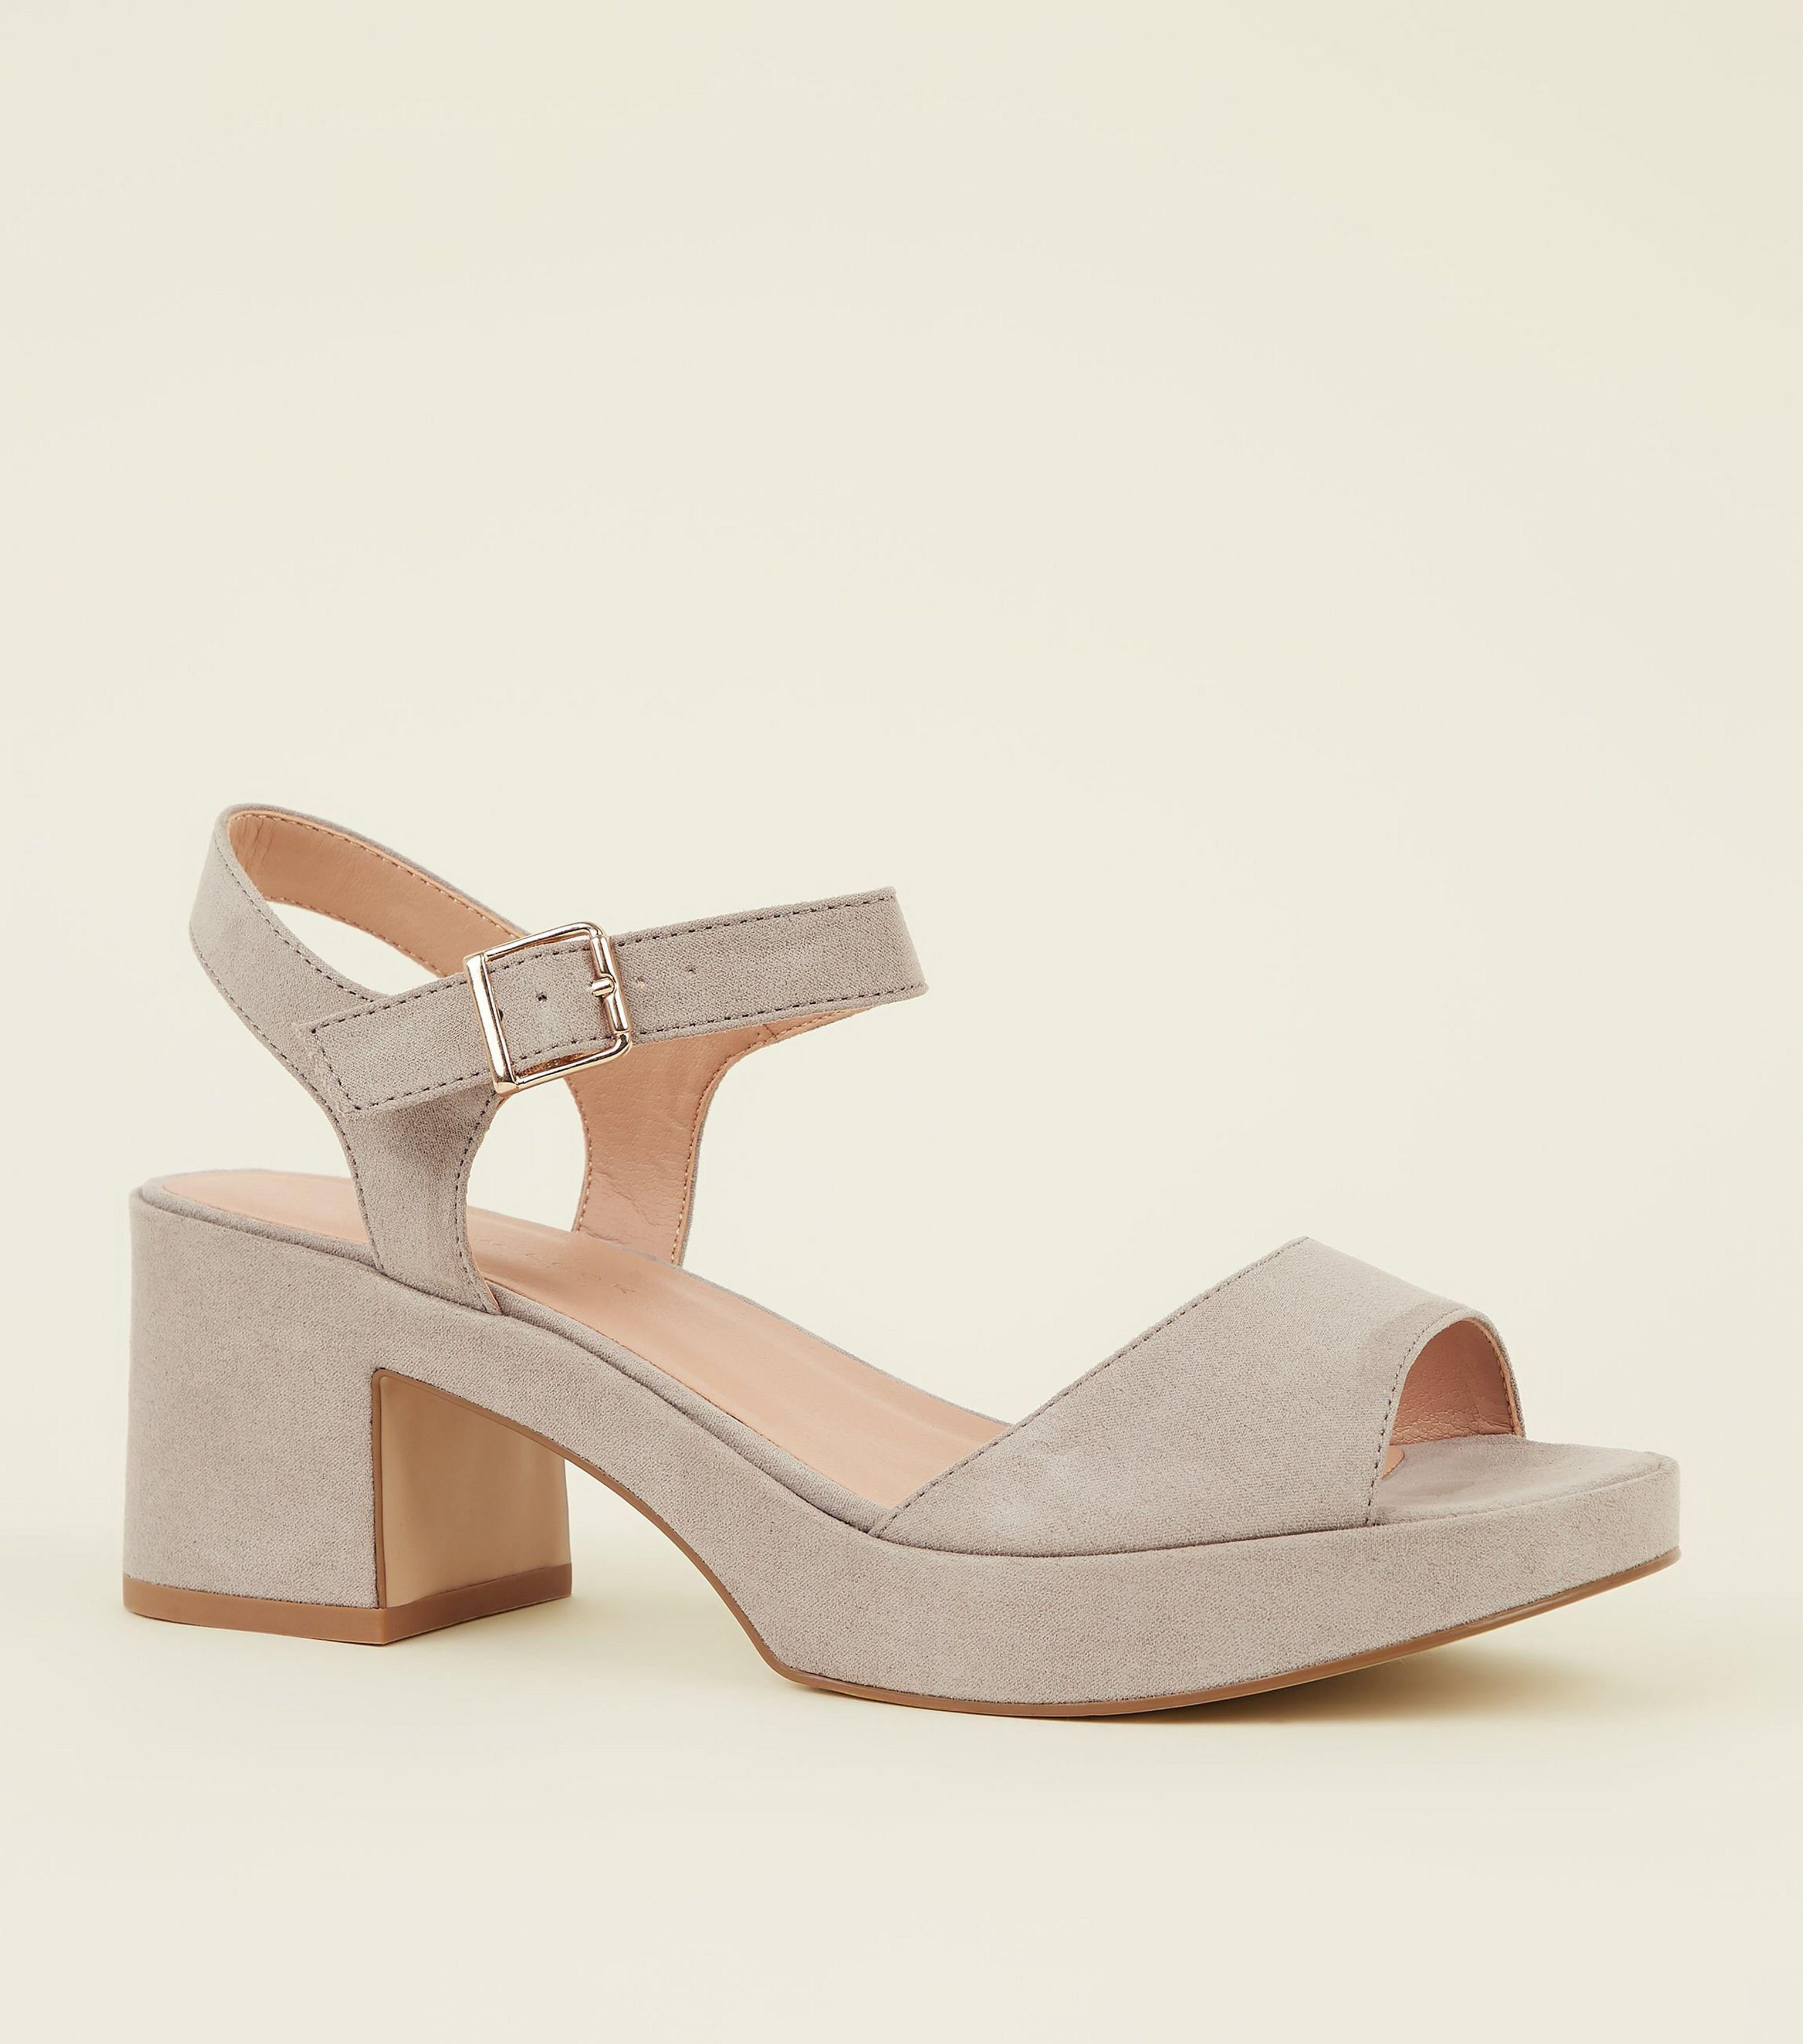 2a96211943bb New Look Wide Fit Grey Suedette Platform Peep Toe Heels in Gray - Lyst